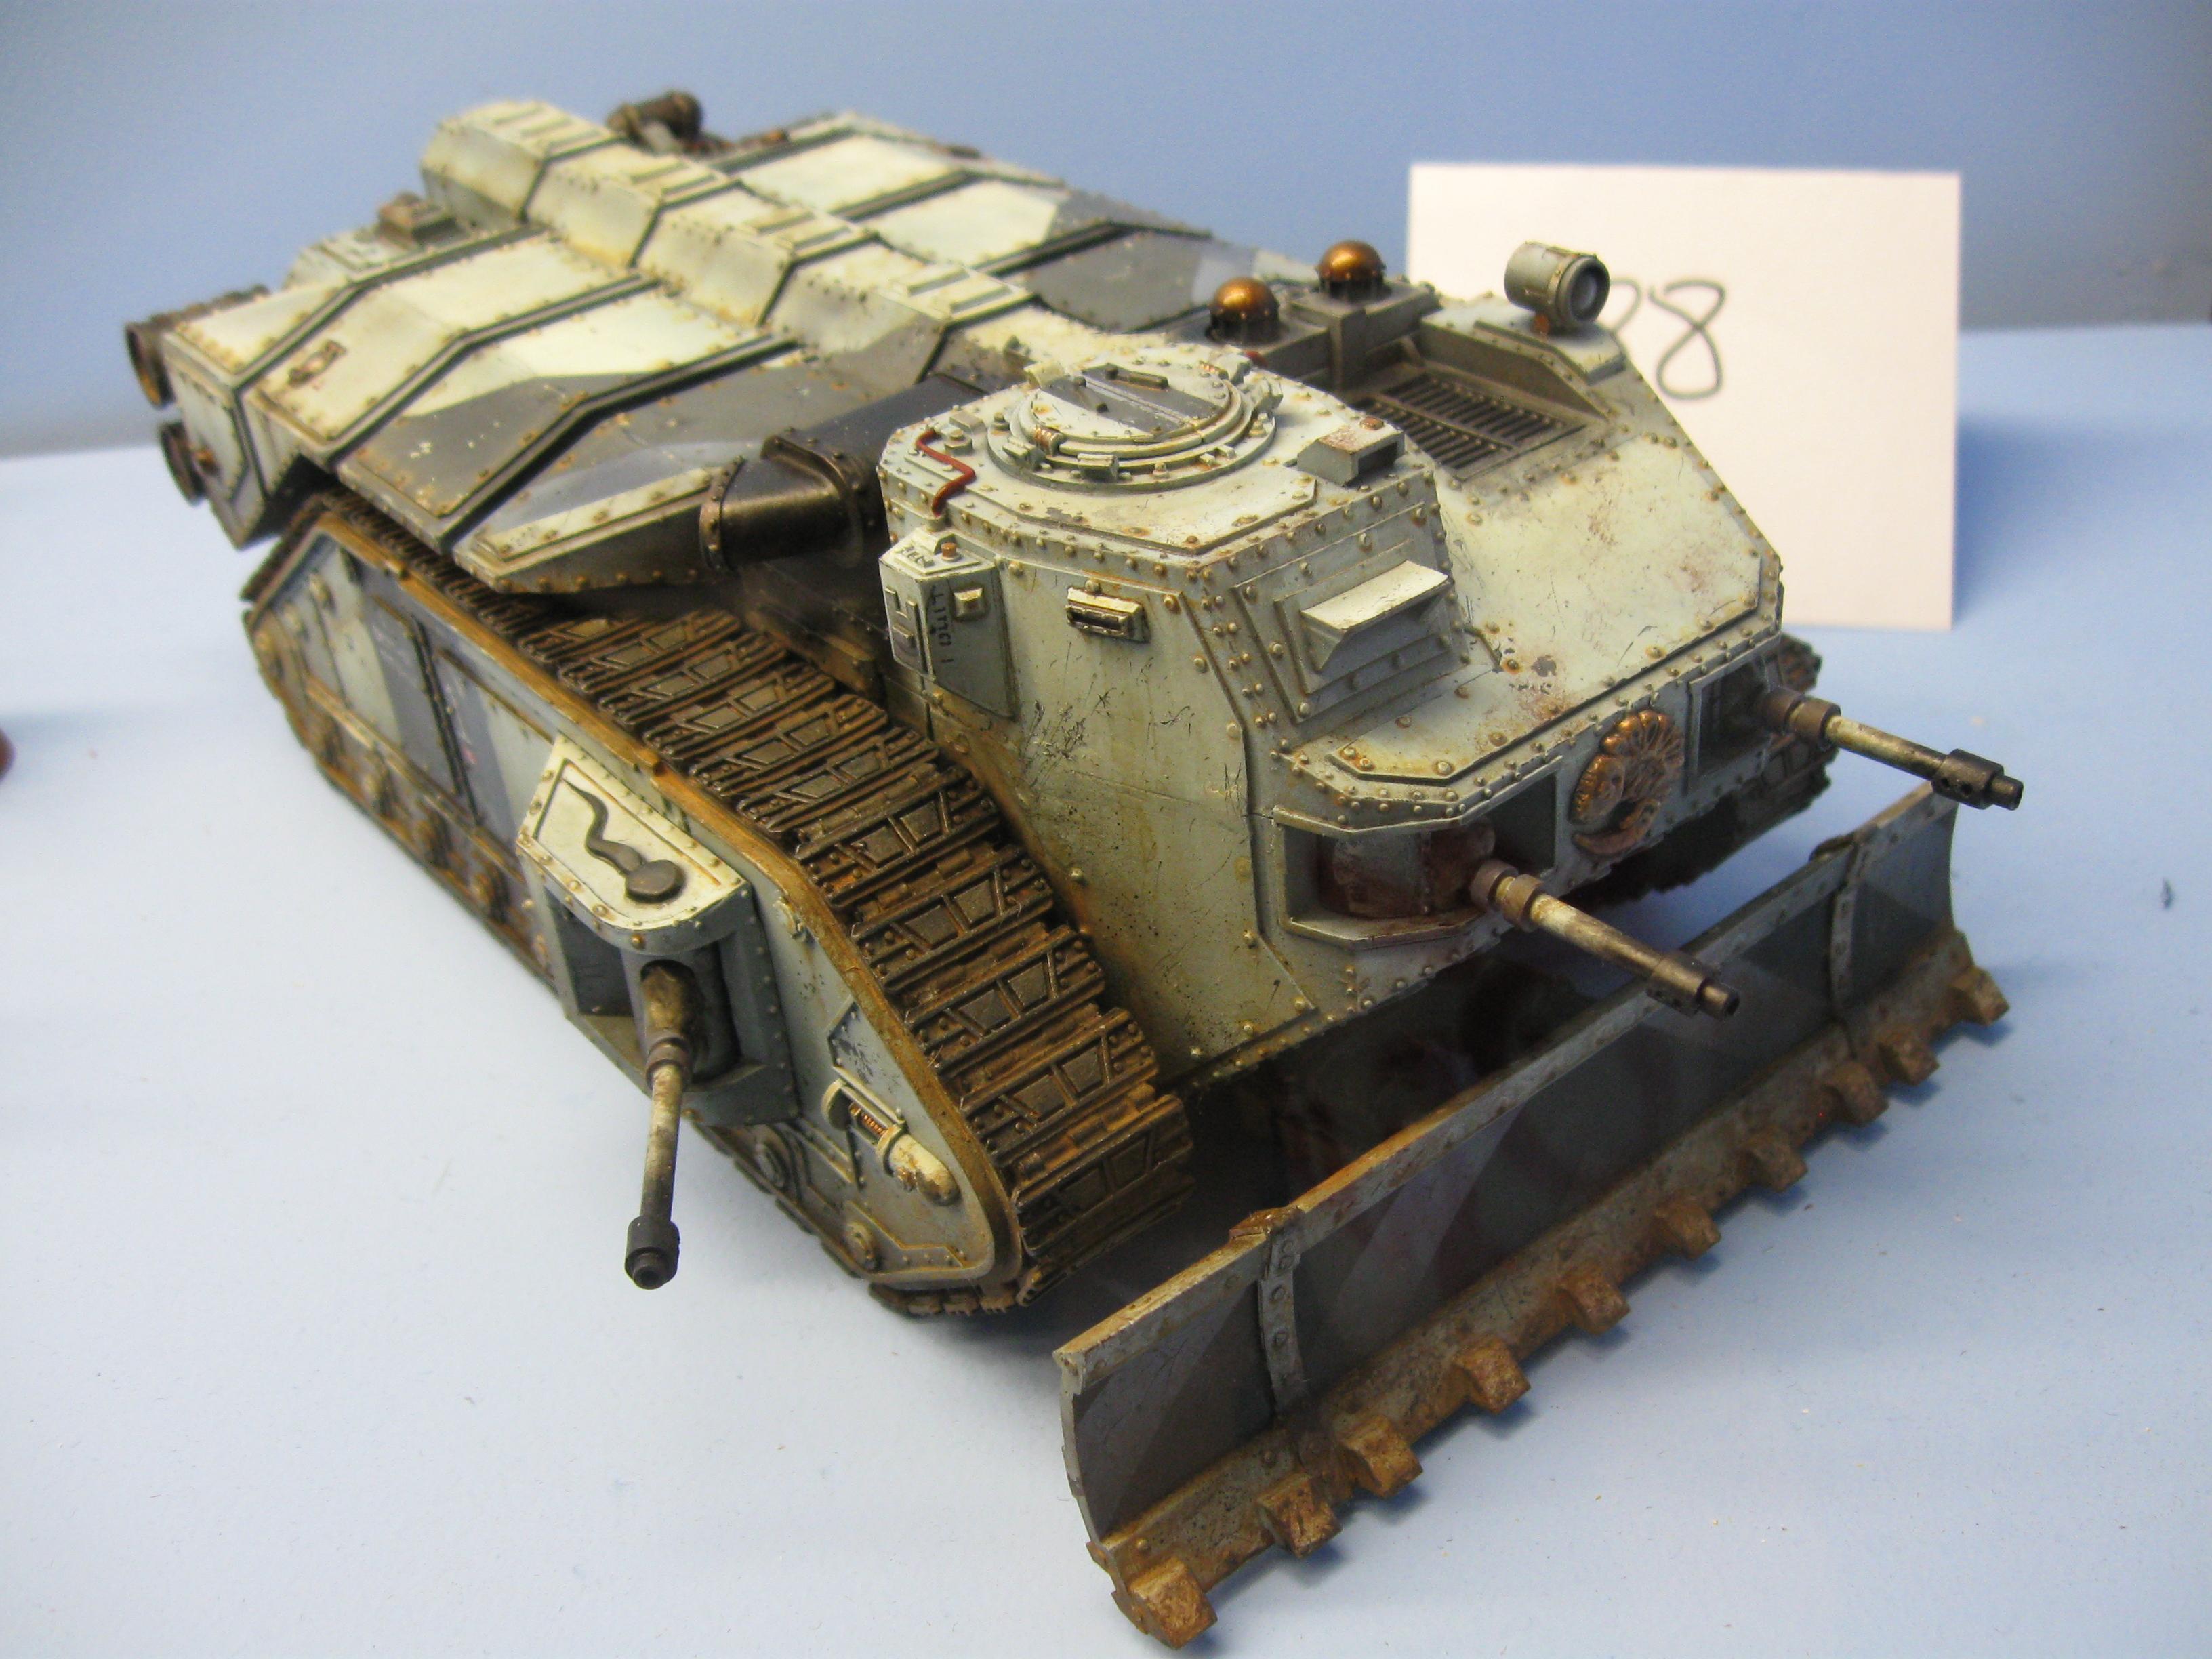 Adepticon 2012, Astra, Astra Militarum, Forge World, Gorgon, Iceangel, Imperial Guard, Super-heavy, Transport, Warhammer 40,000